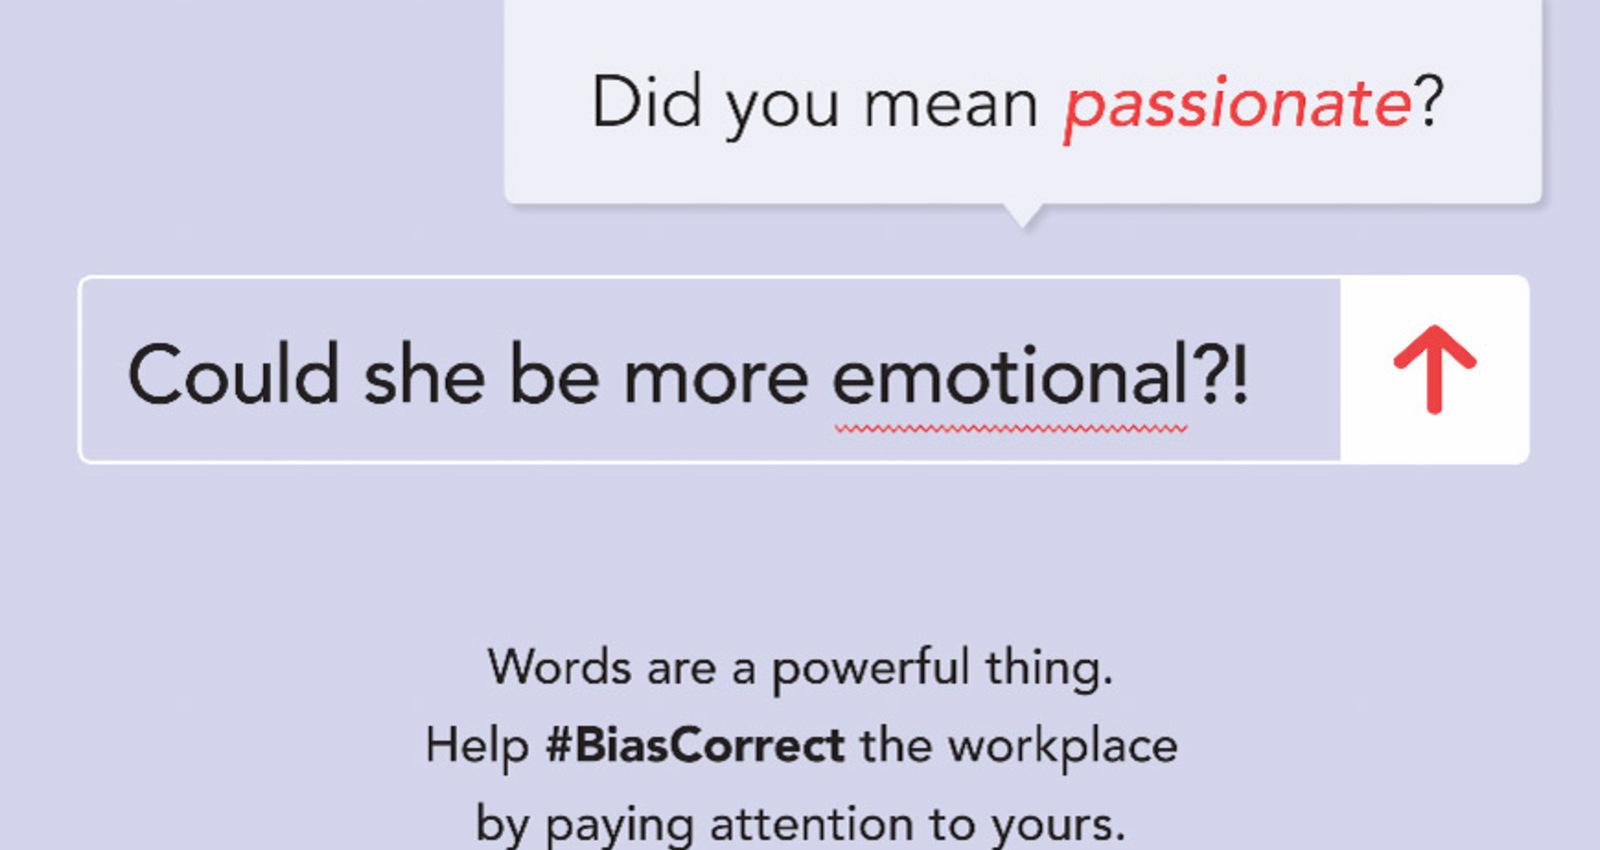 #BiasCorrect